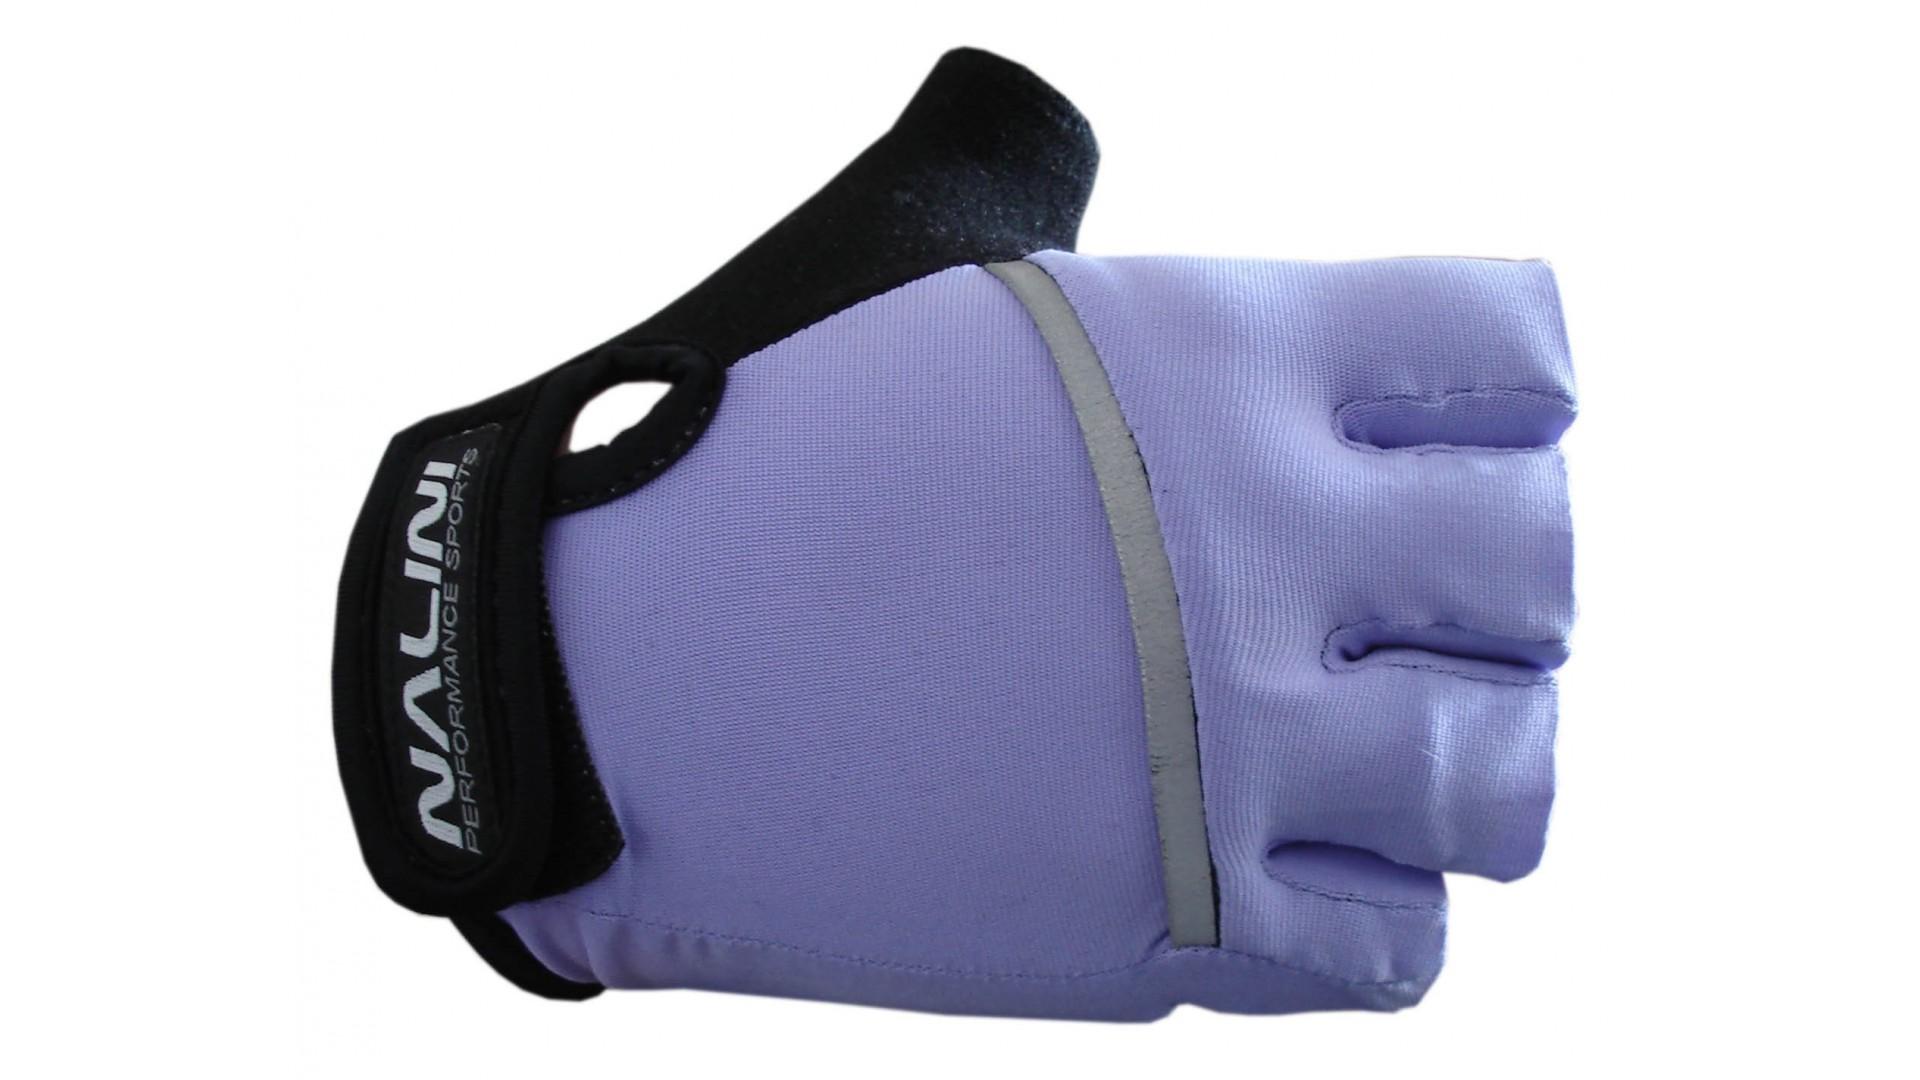 Велоперчатки Nalini Fenicottero летние фиолетовые